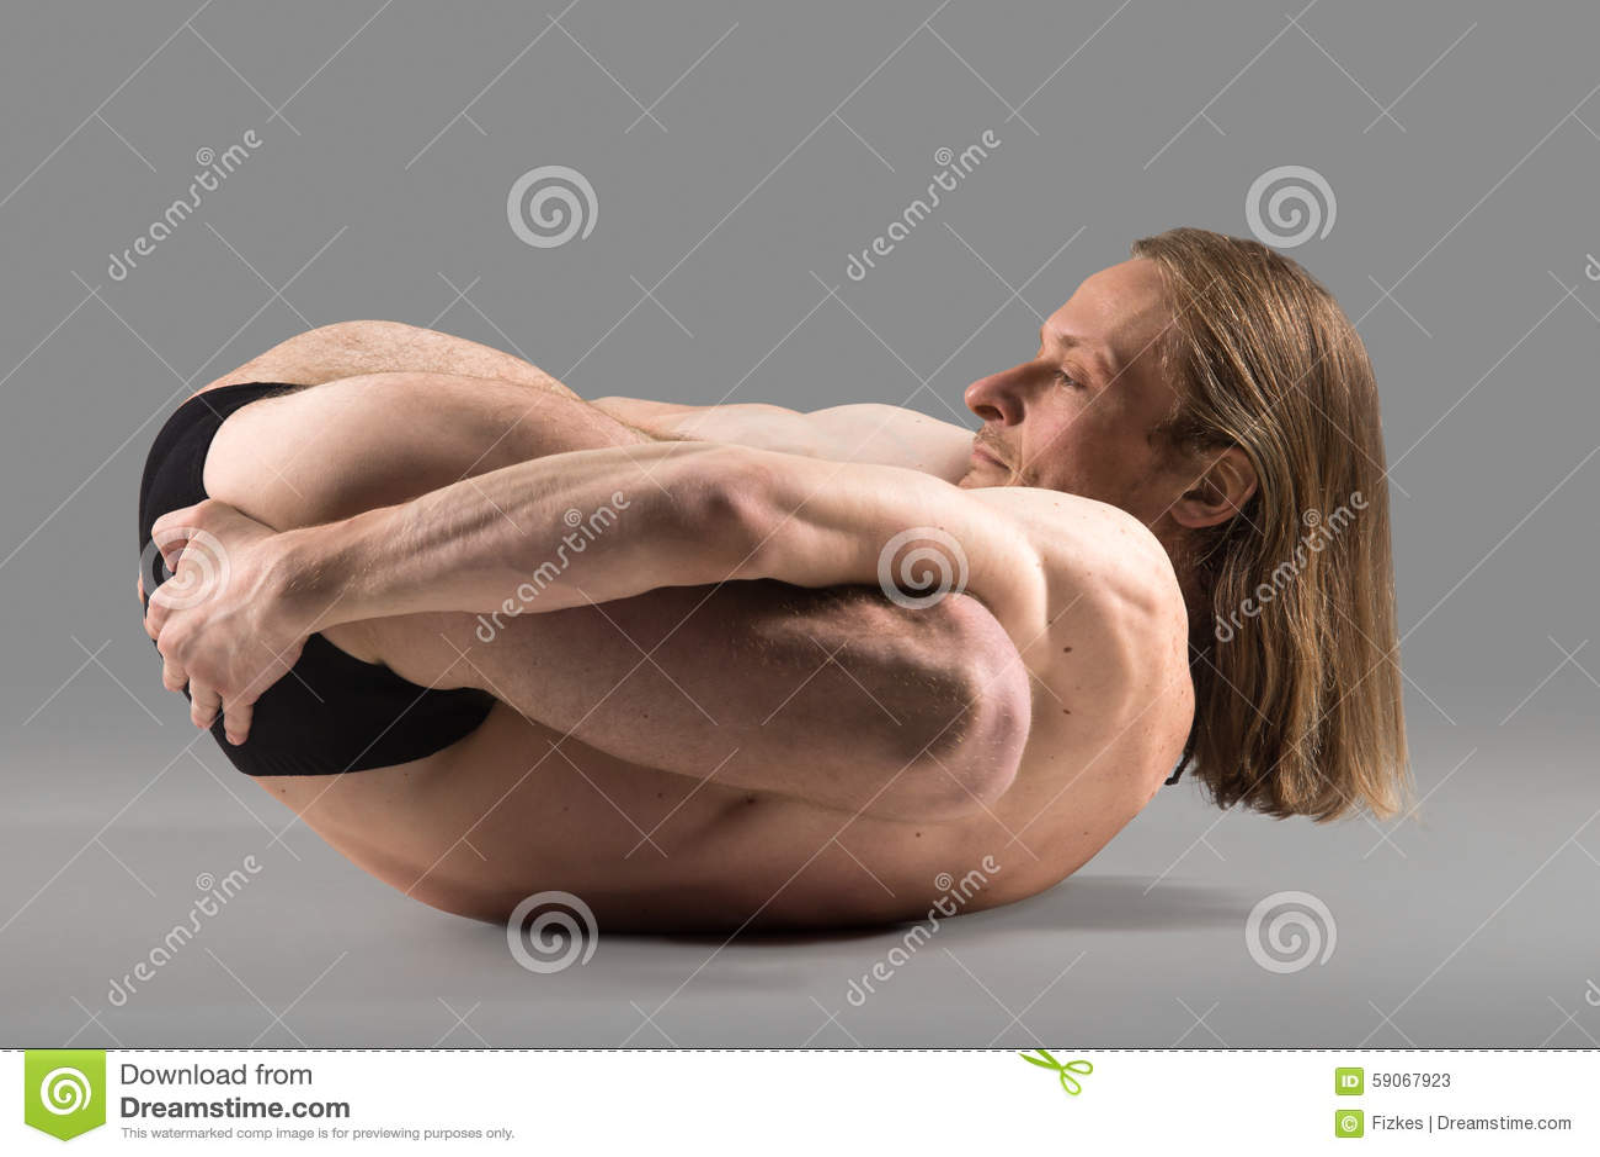 Padma Yoganidrasana Pose Stock Photo - Image: 59067923